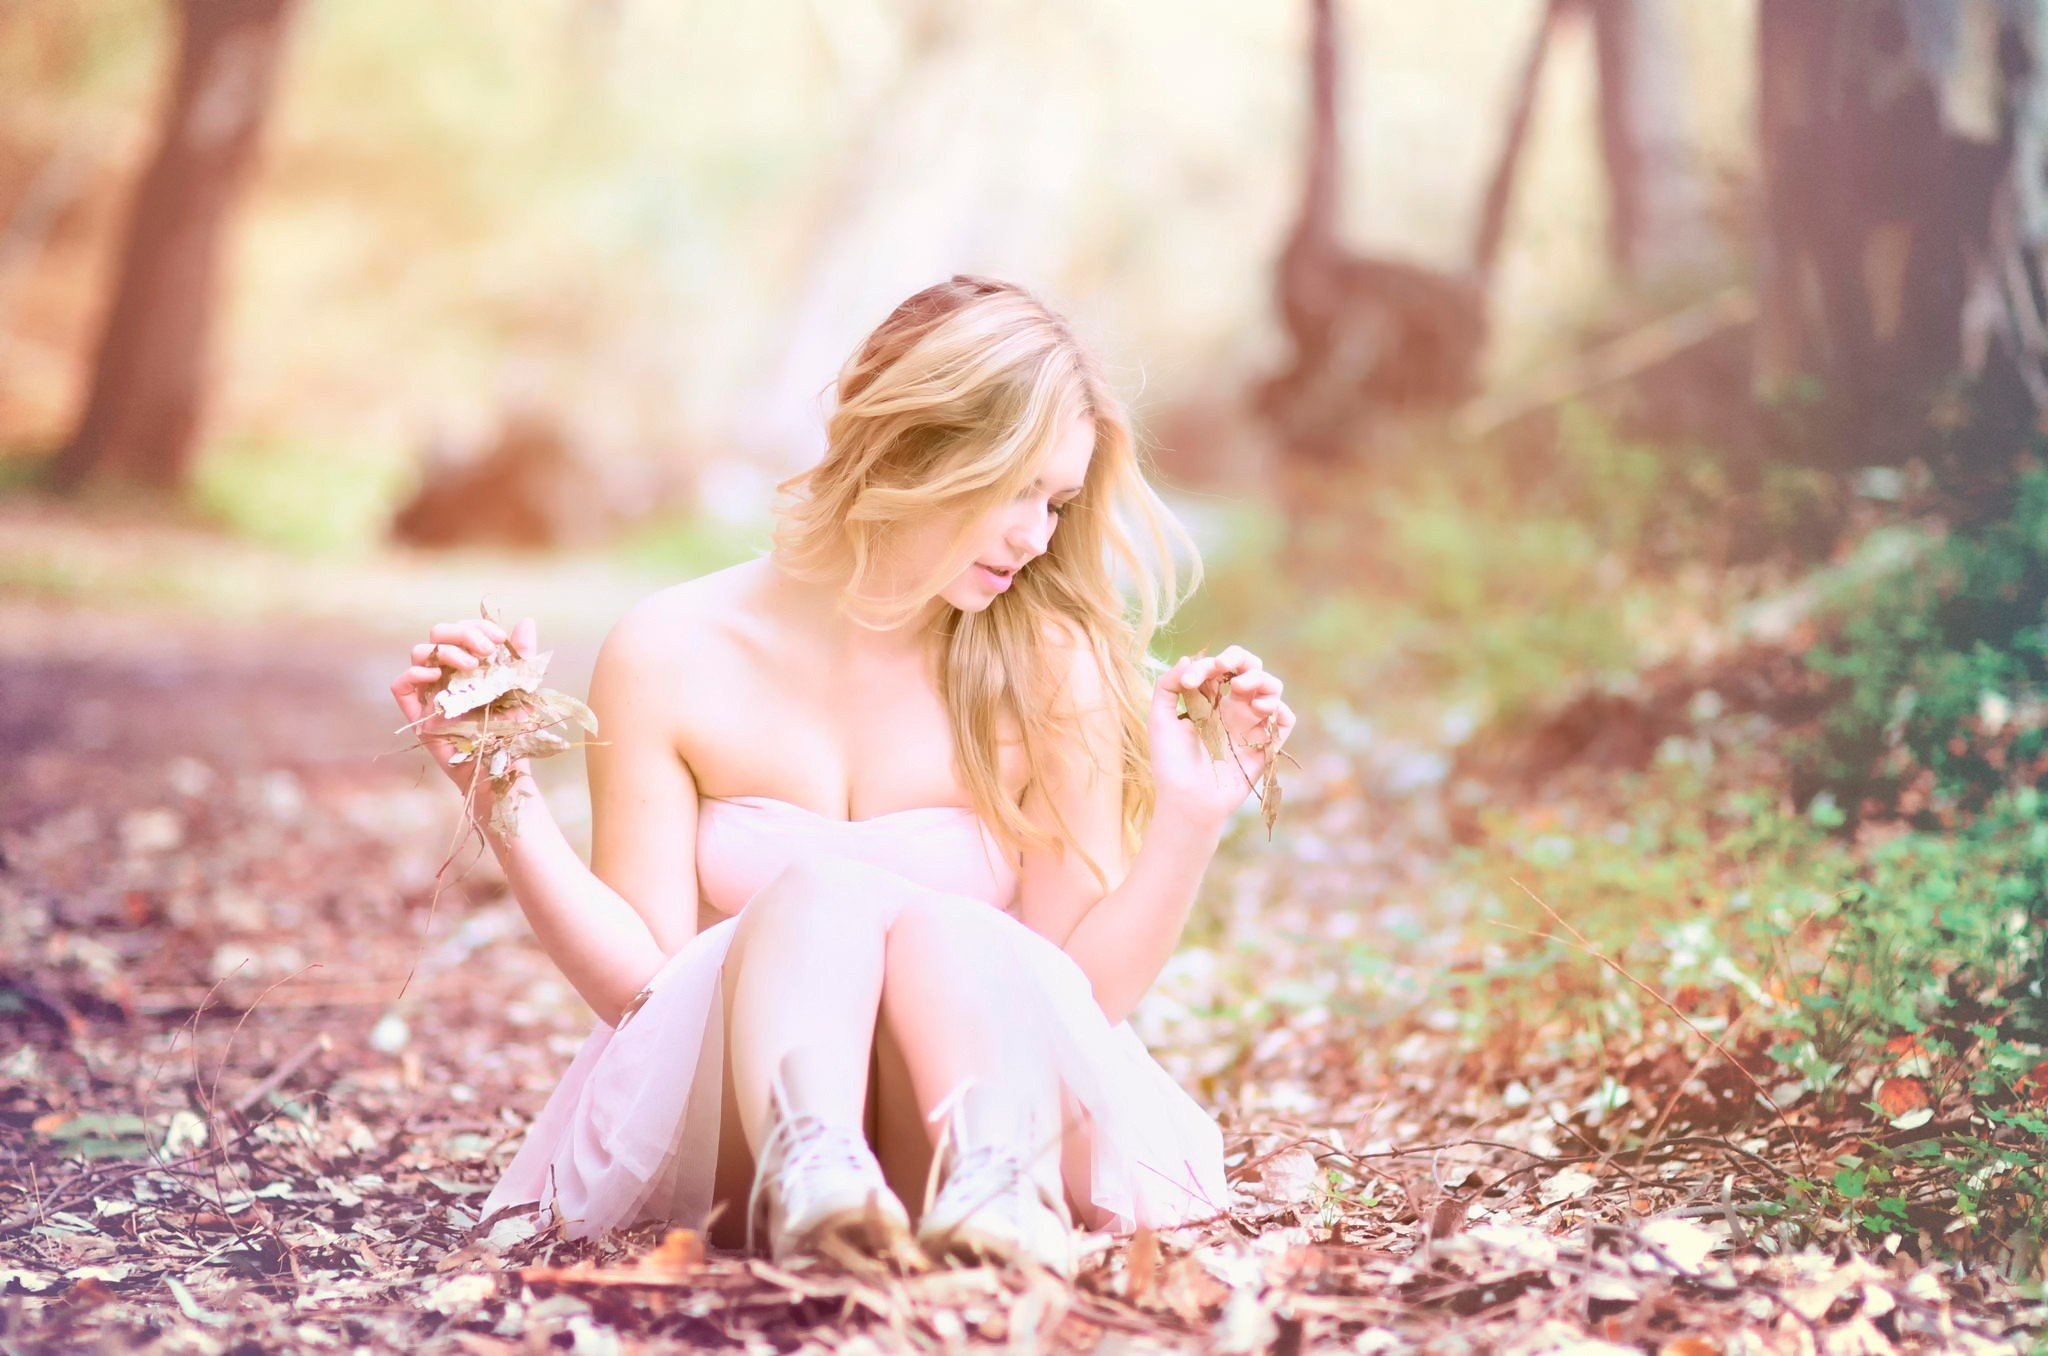 women, Women outdoors, White dress Wallpaper